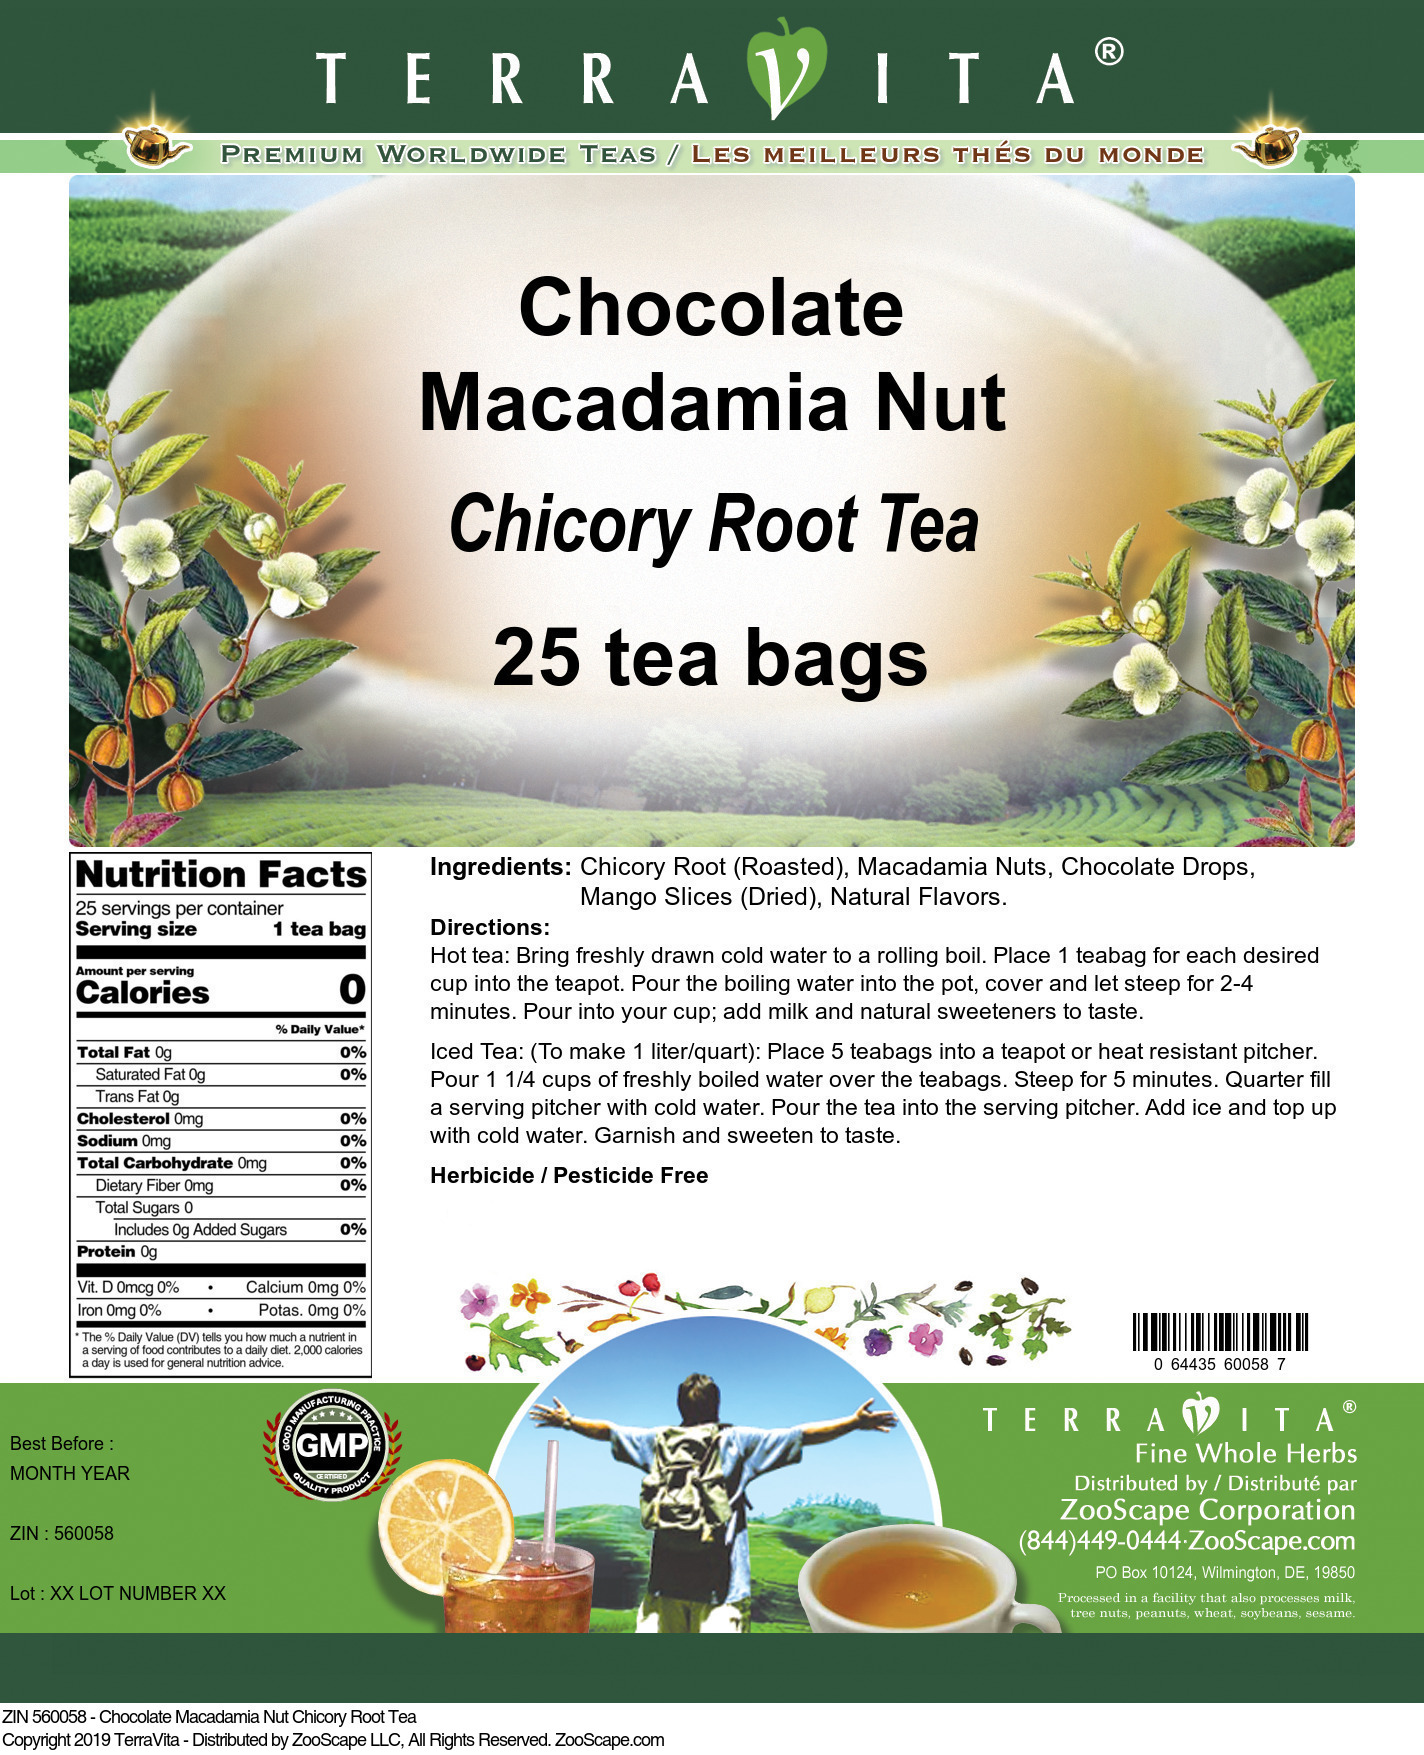 Chocolate Macadamia Nut Chicory Root Tea